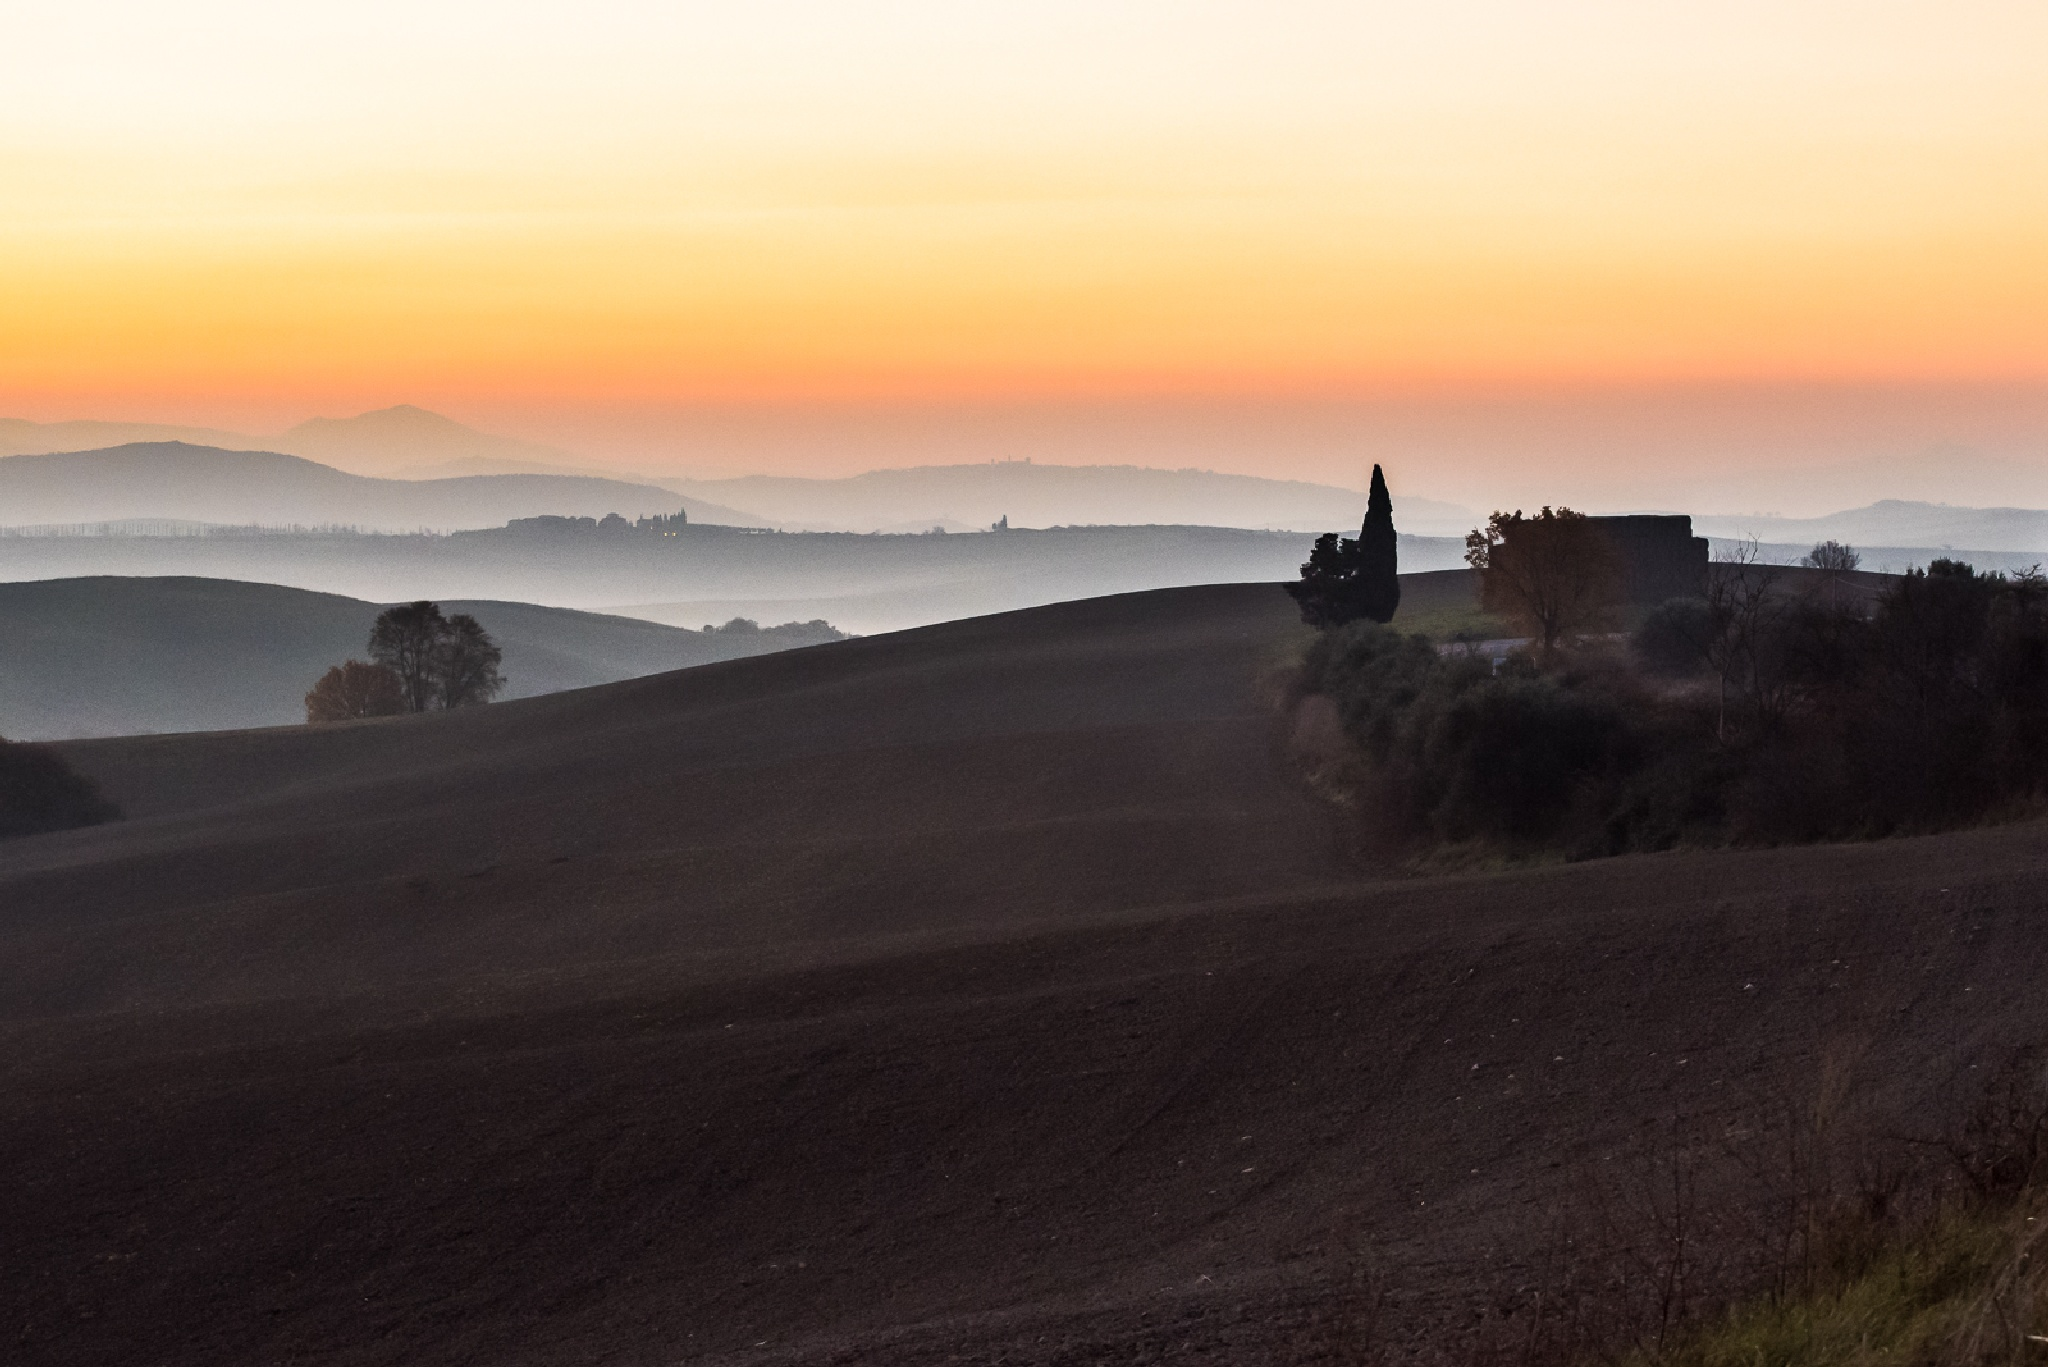 Val d'orcia suset by Francesco Monari